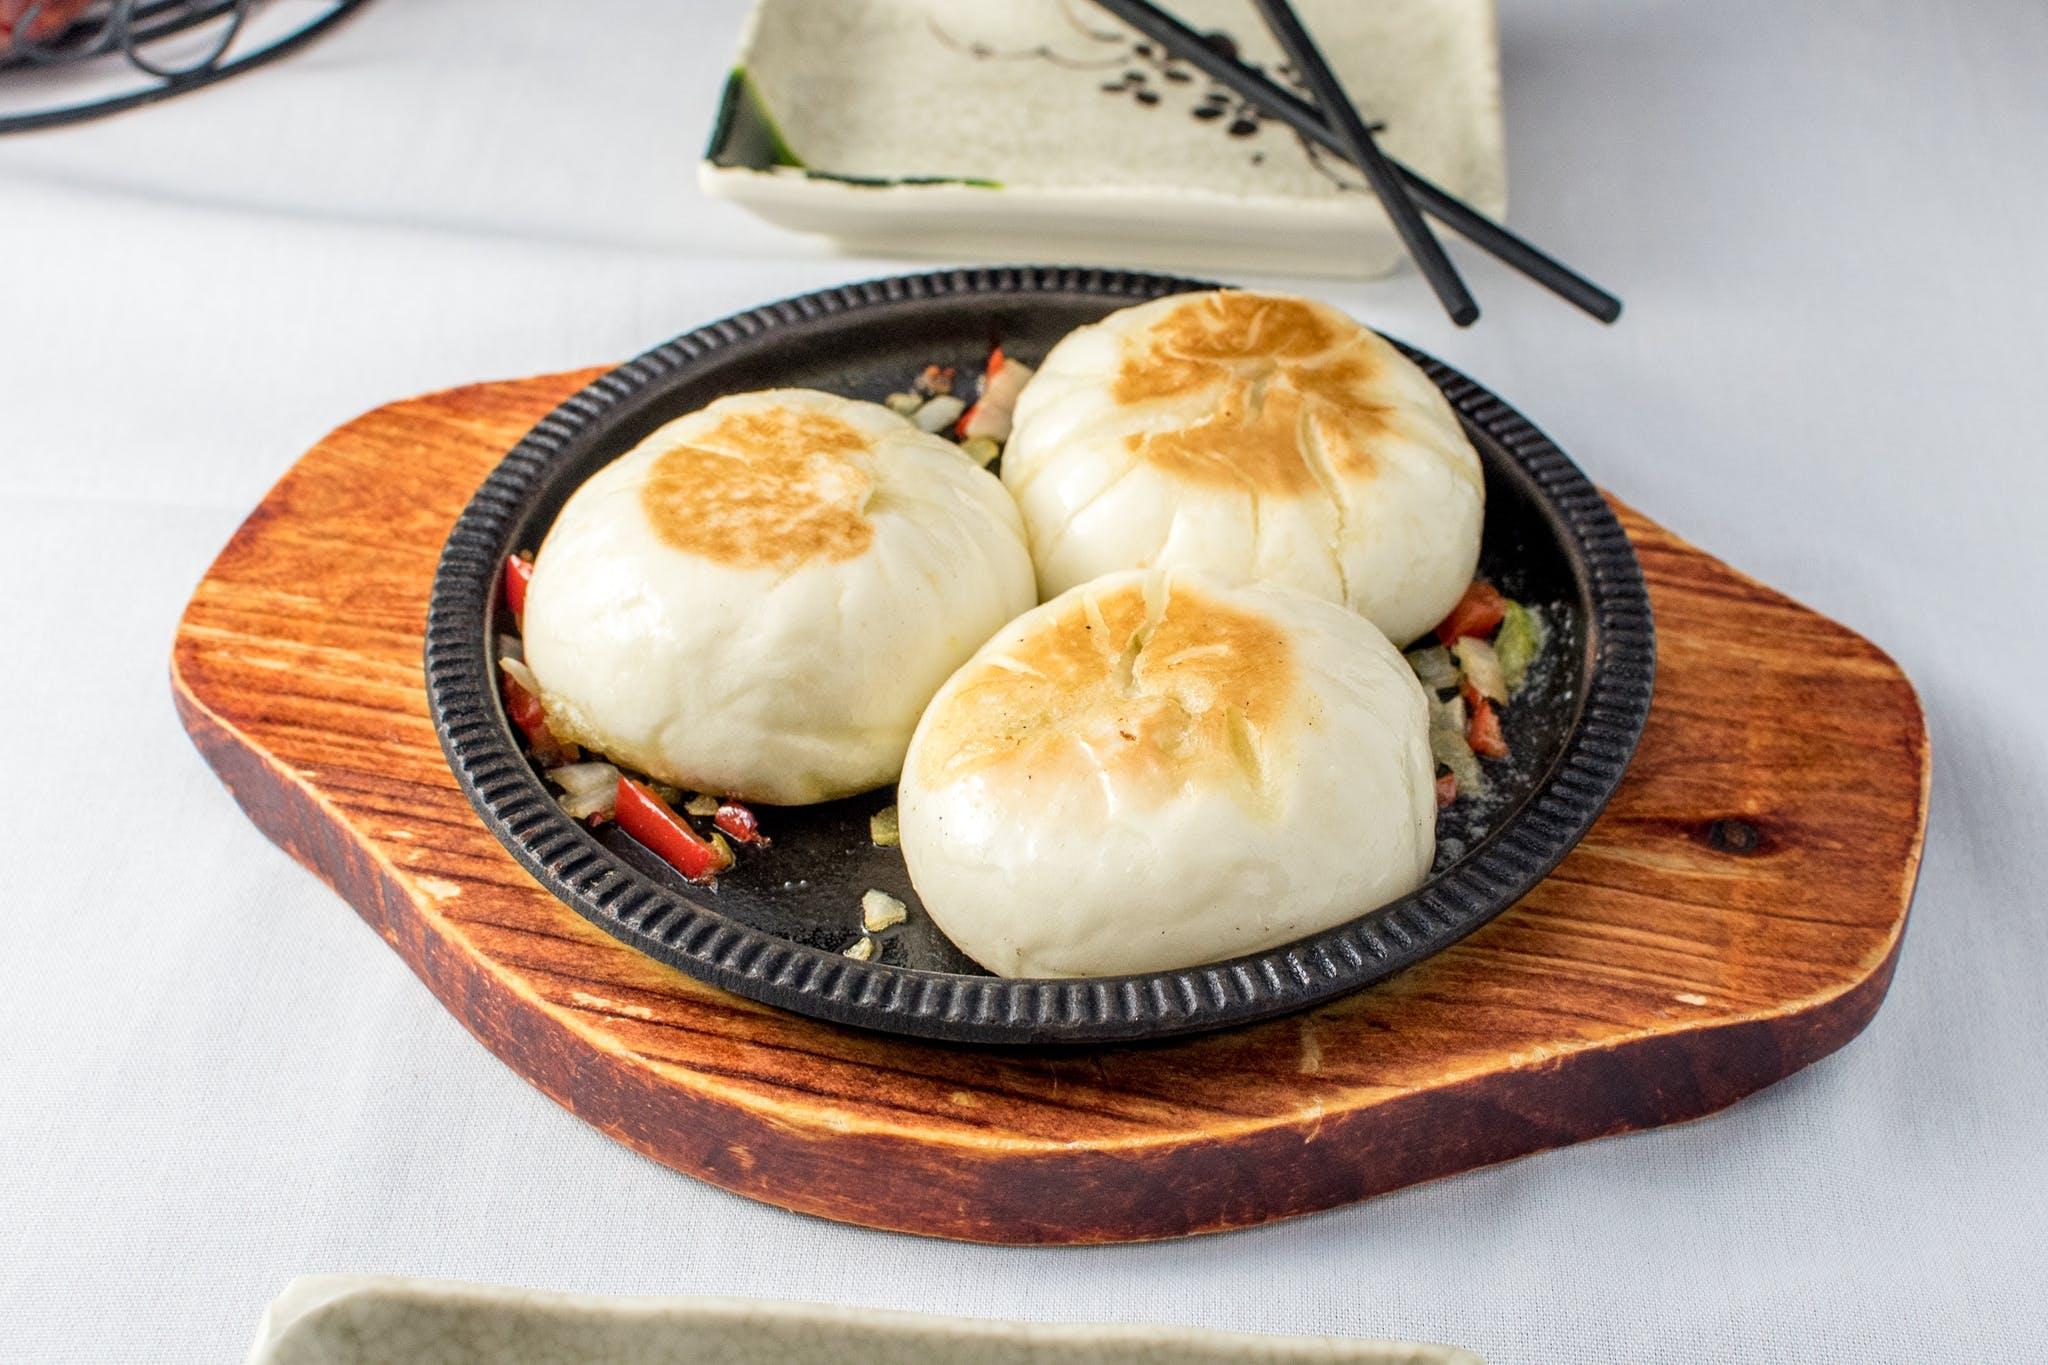 29. Pan-Fried Vegetable, Pork & Shrimp Bun from Nani Restaurant in Madison, WI